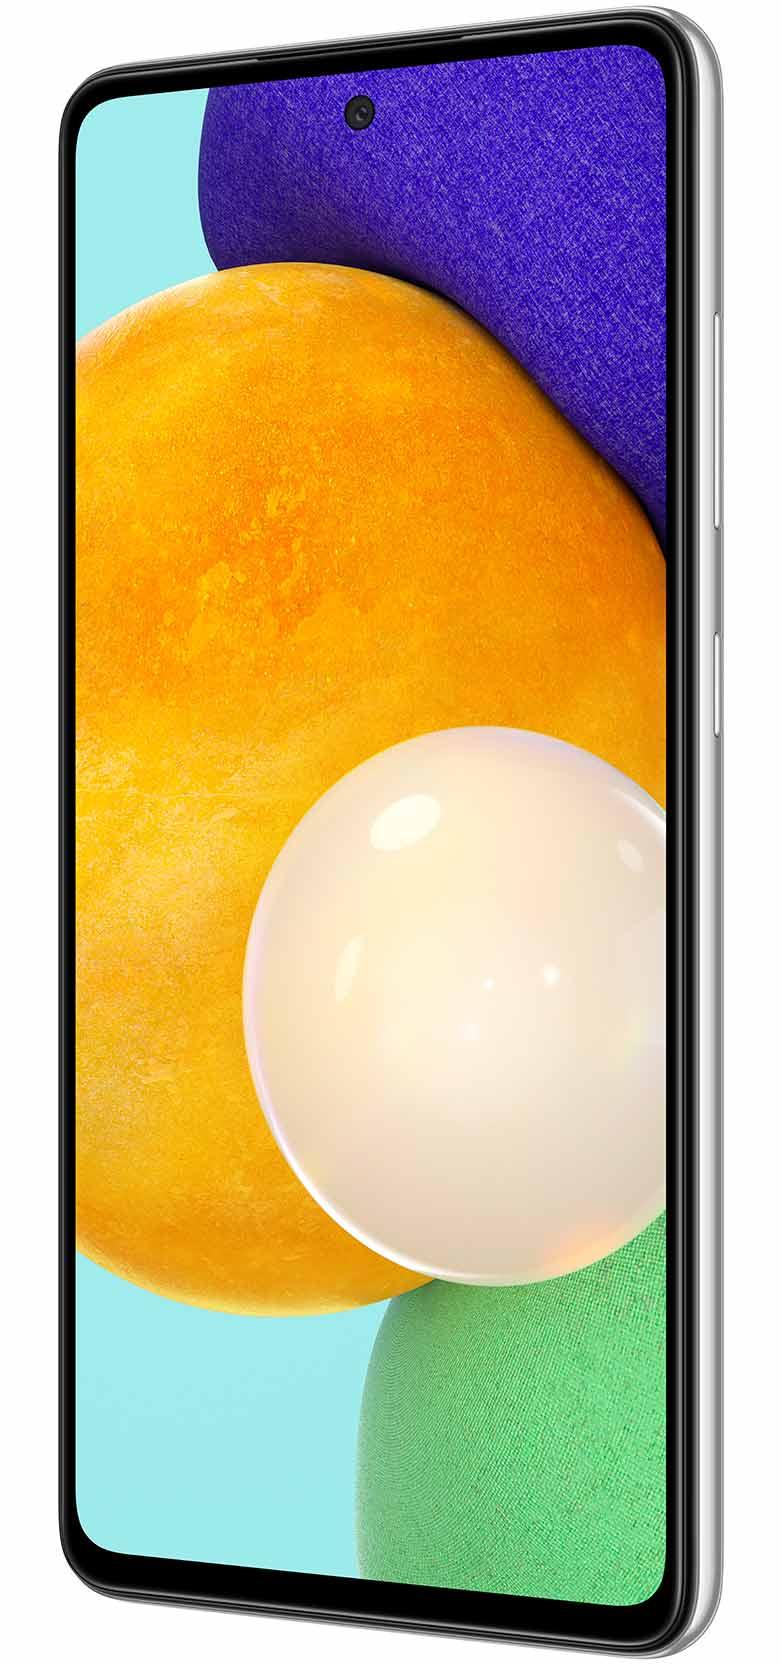 Samsung Galaxy A52 DS (SM-A525) 256GB White - 2